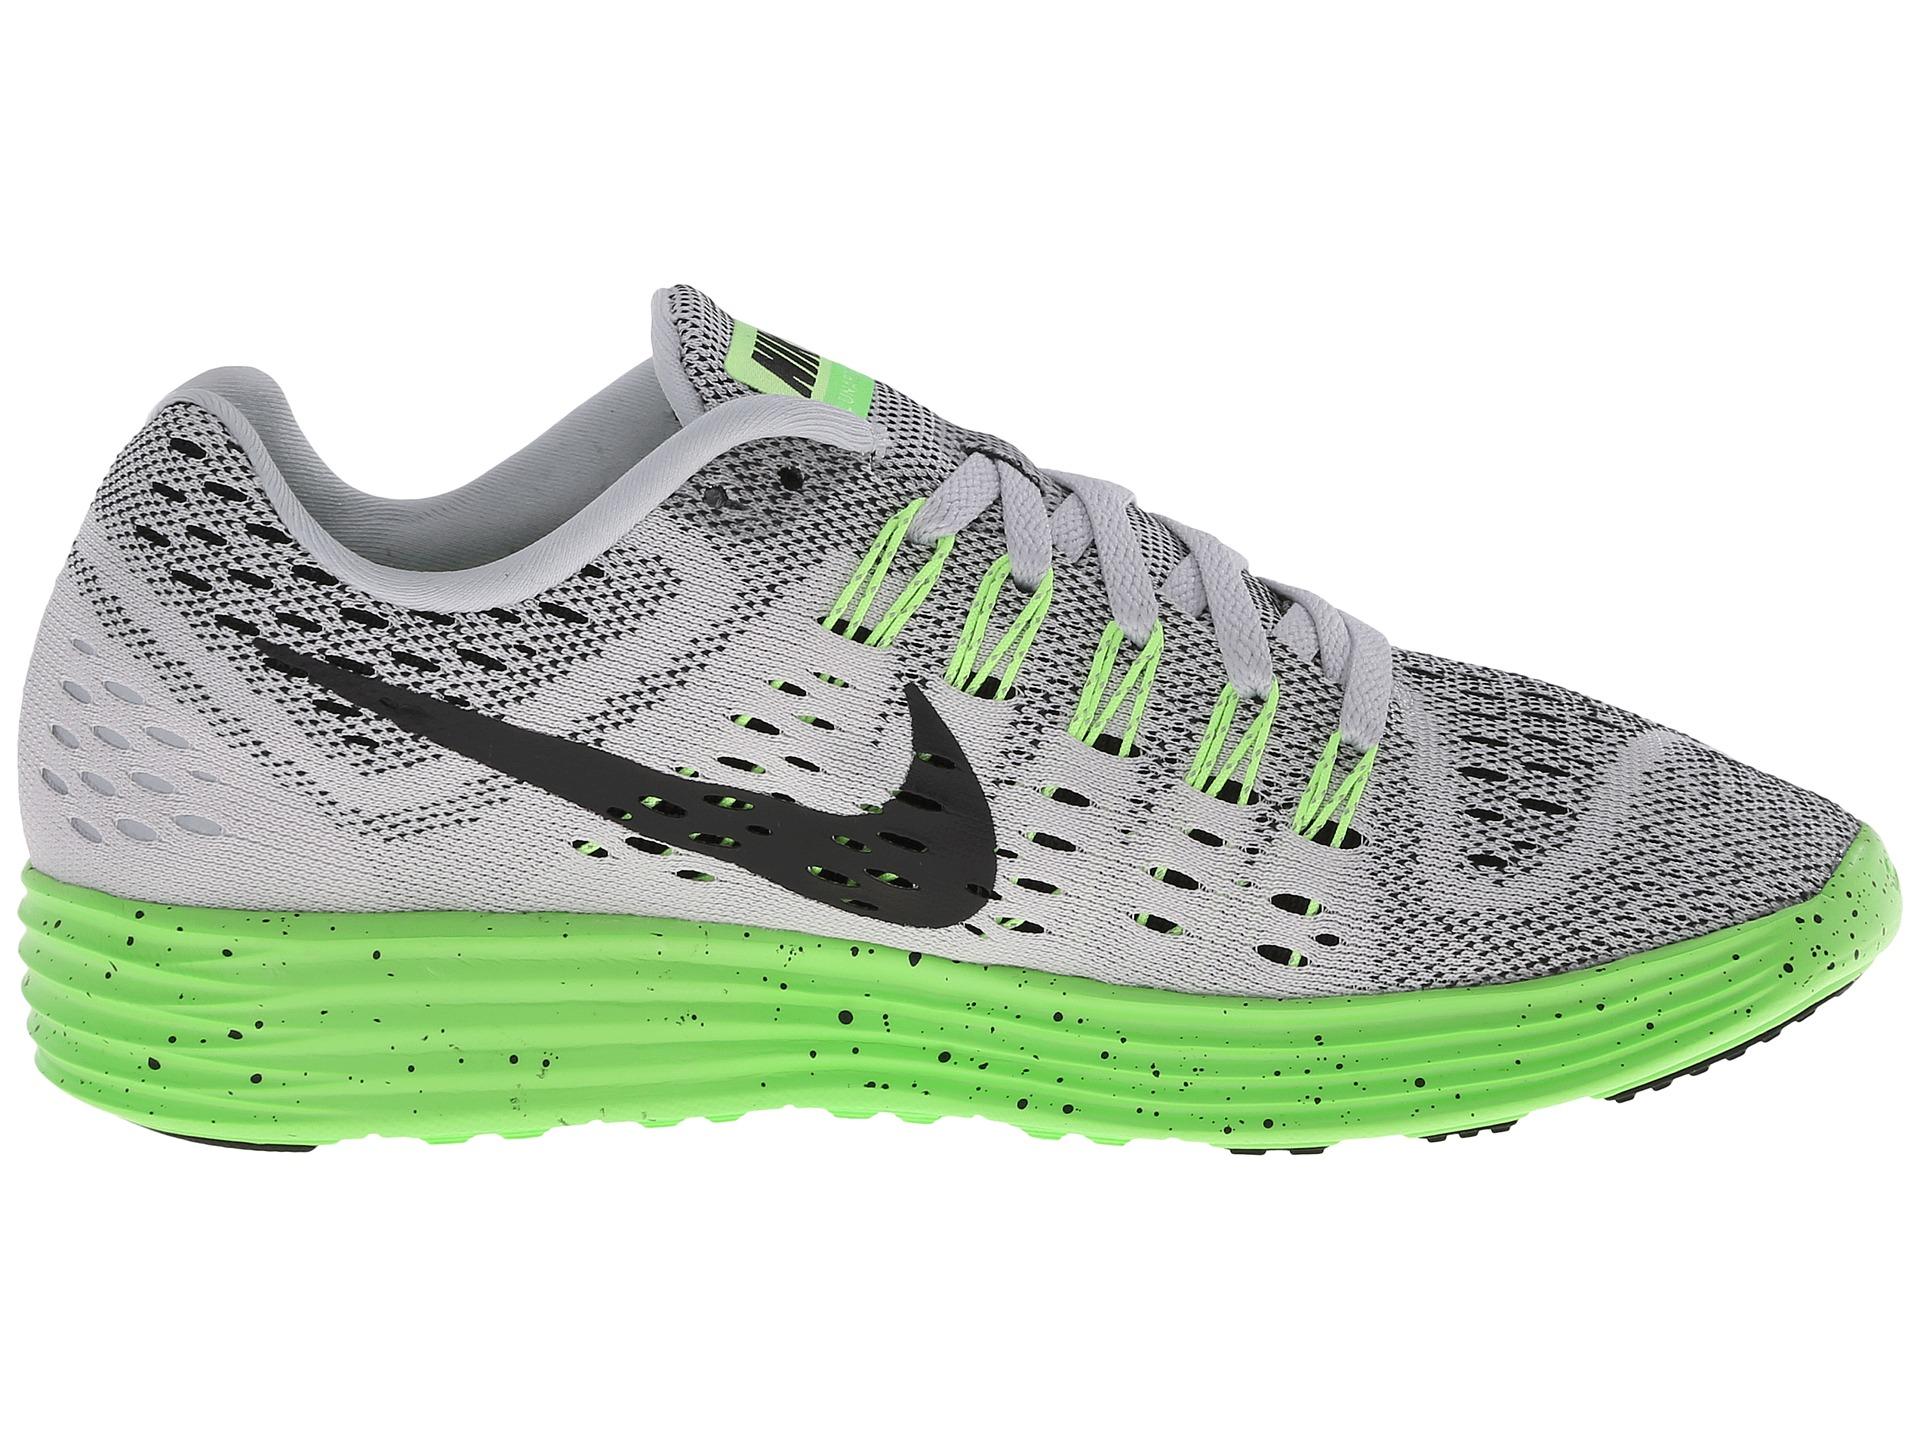 03e4f6b958a Lyst - Nike Lunartempo in Green